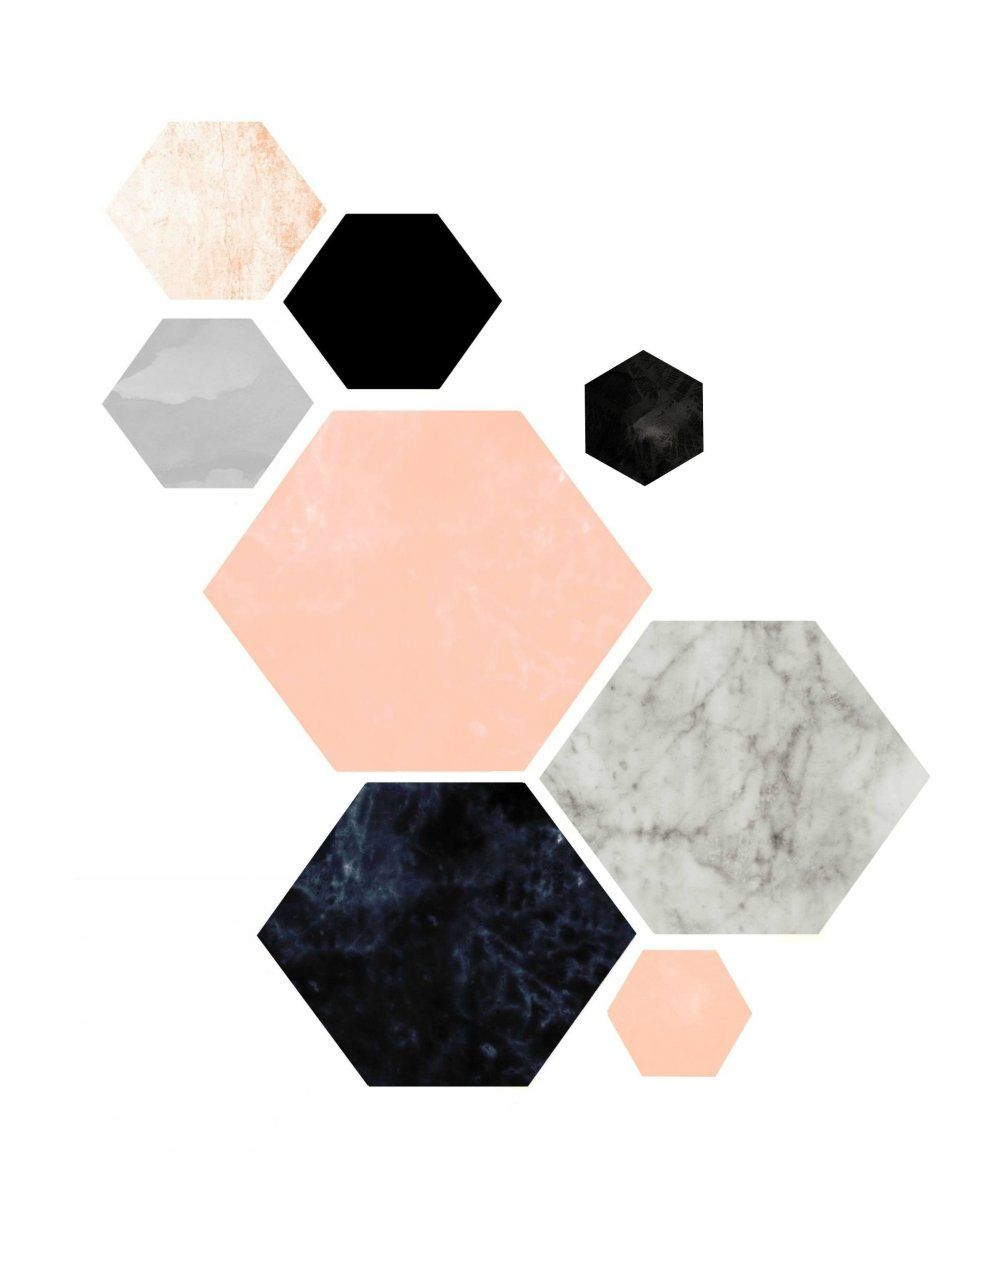 Triptych Wall Art, Geometric Prints, Set of 3 Prints, Scandinavian ...